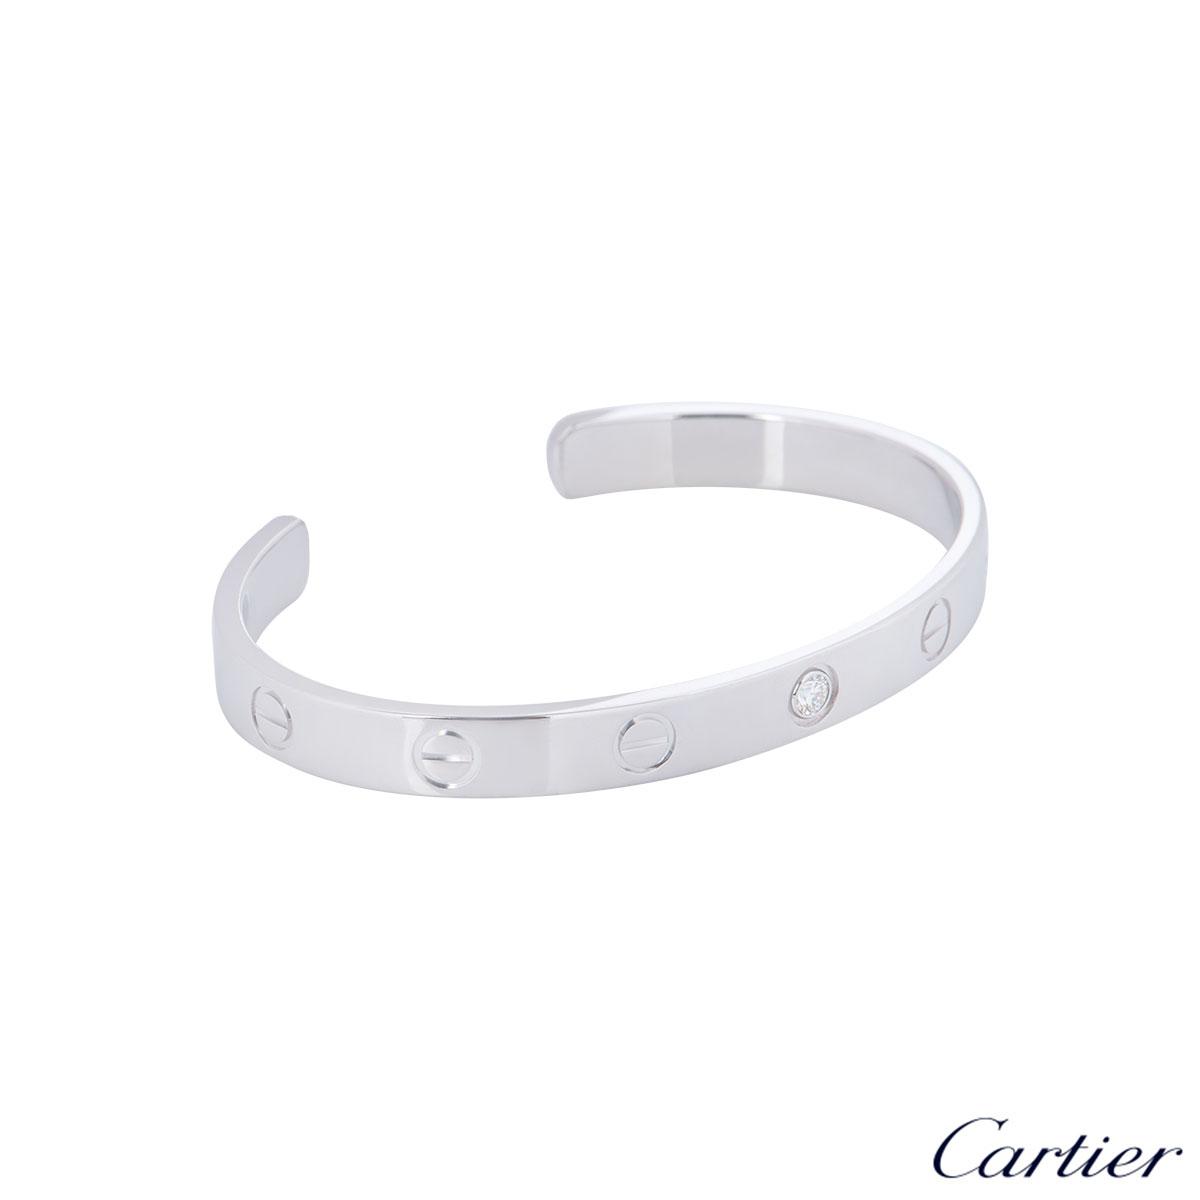 Cartier White Gold Diamond Cuff Love Bracelet Size 16 B6029916